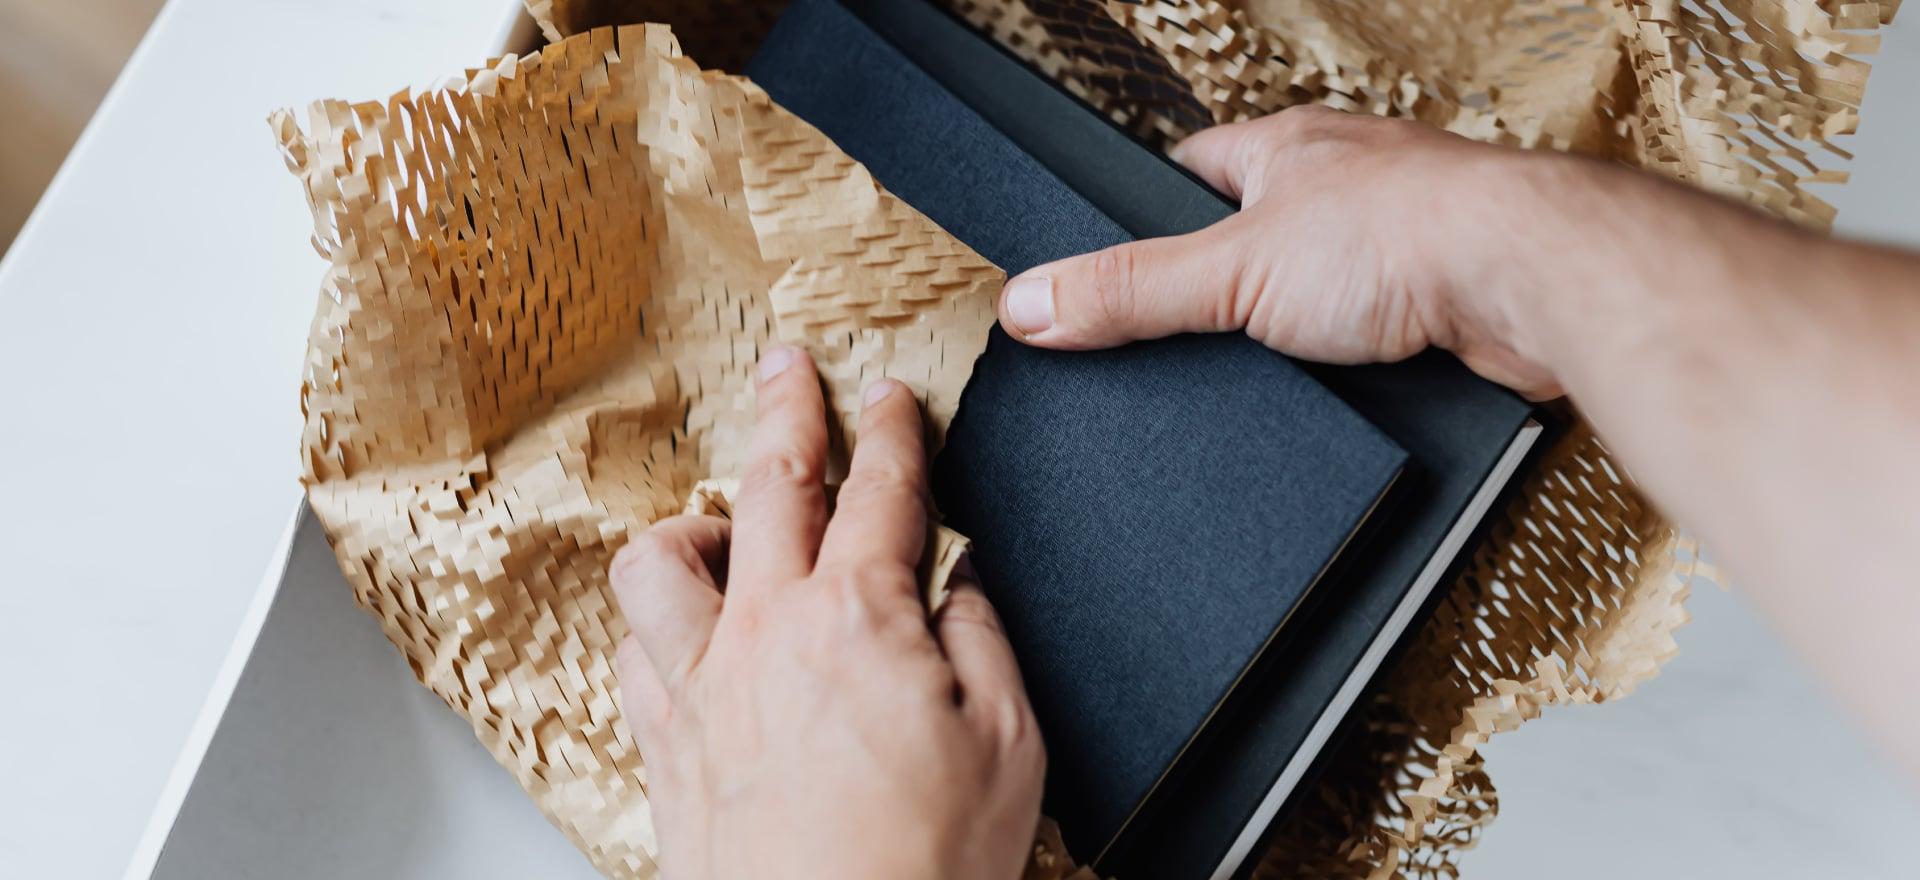 A person unwrapping books